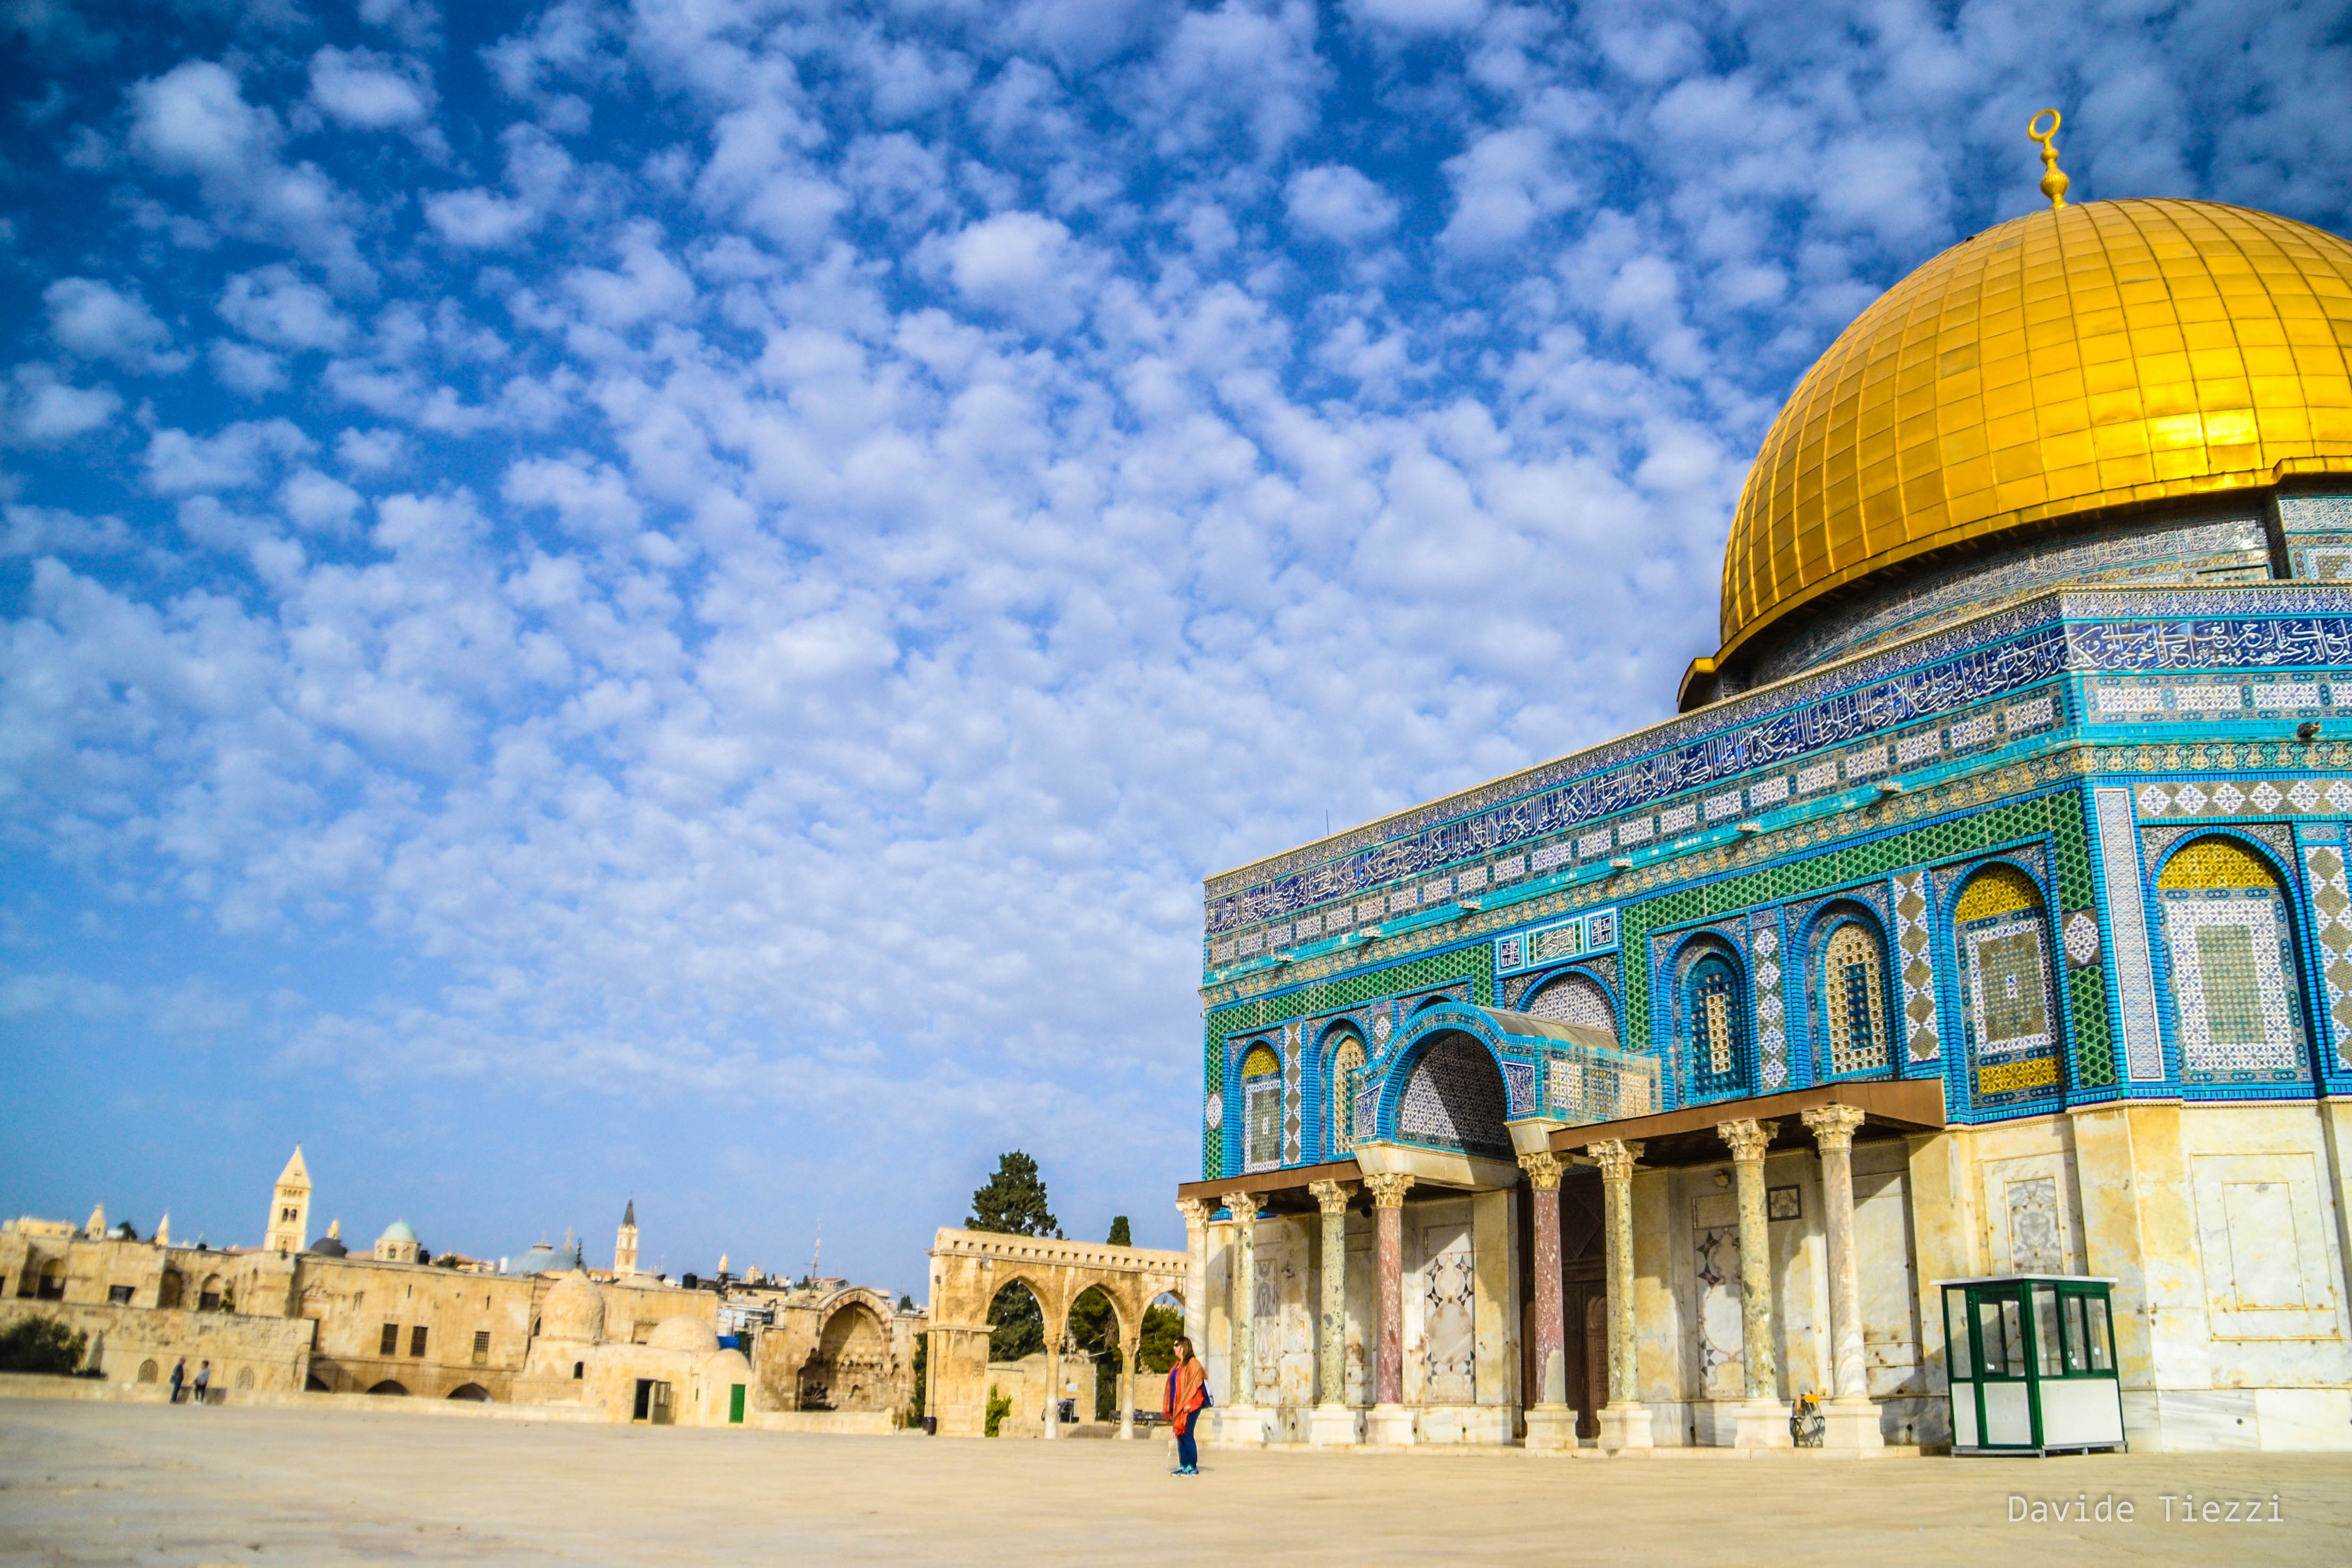 Gerusalemme -Cupola della Roccia